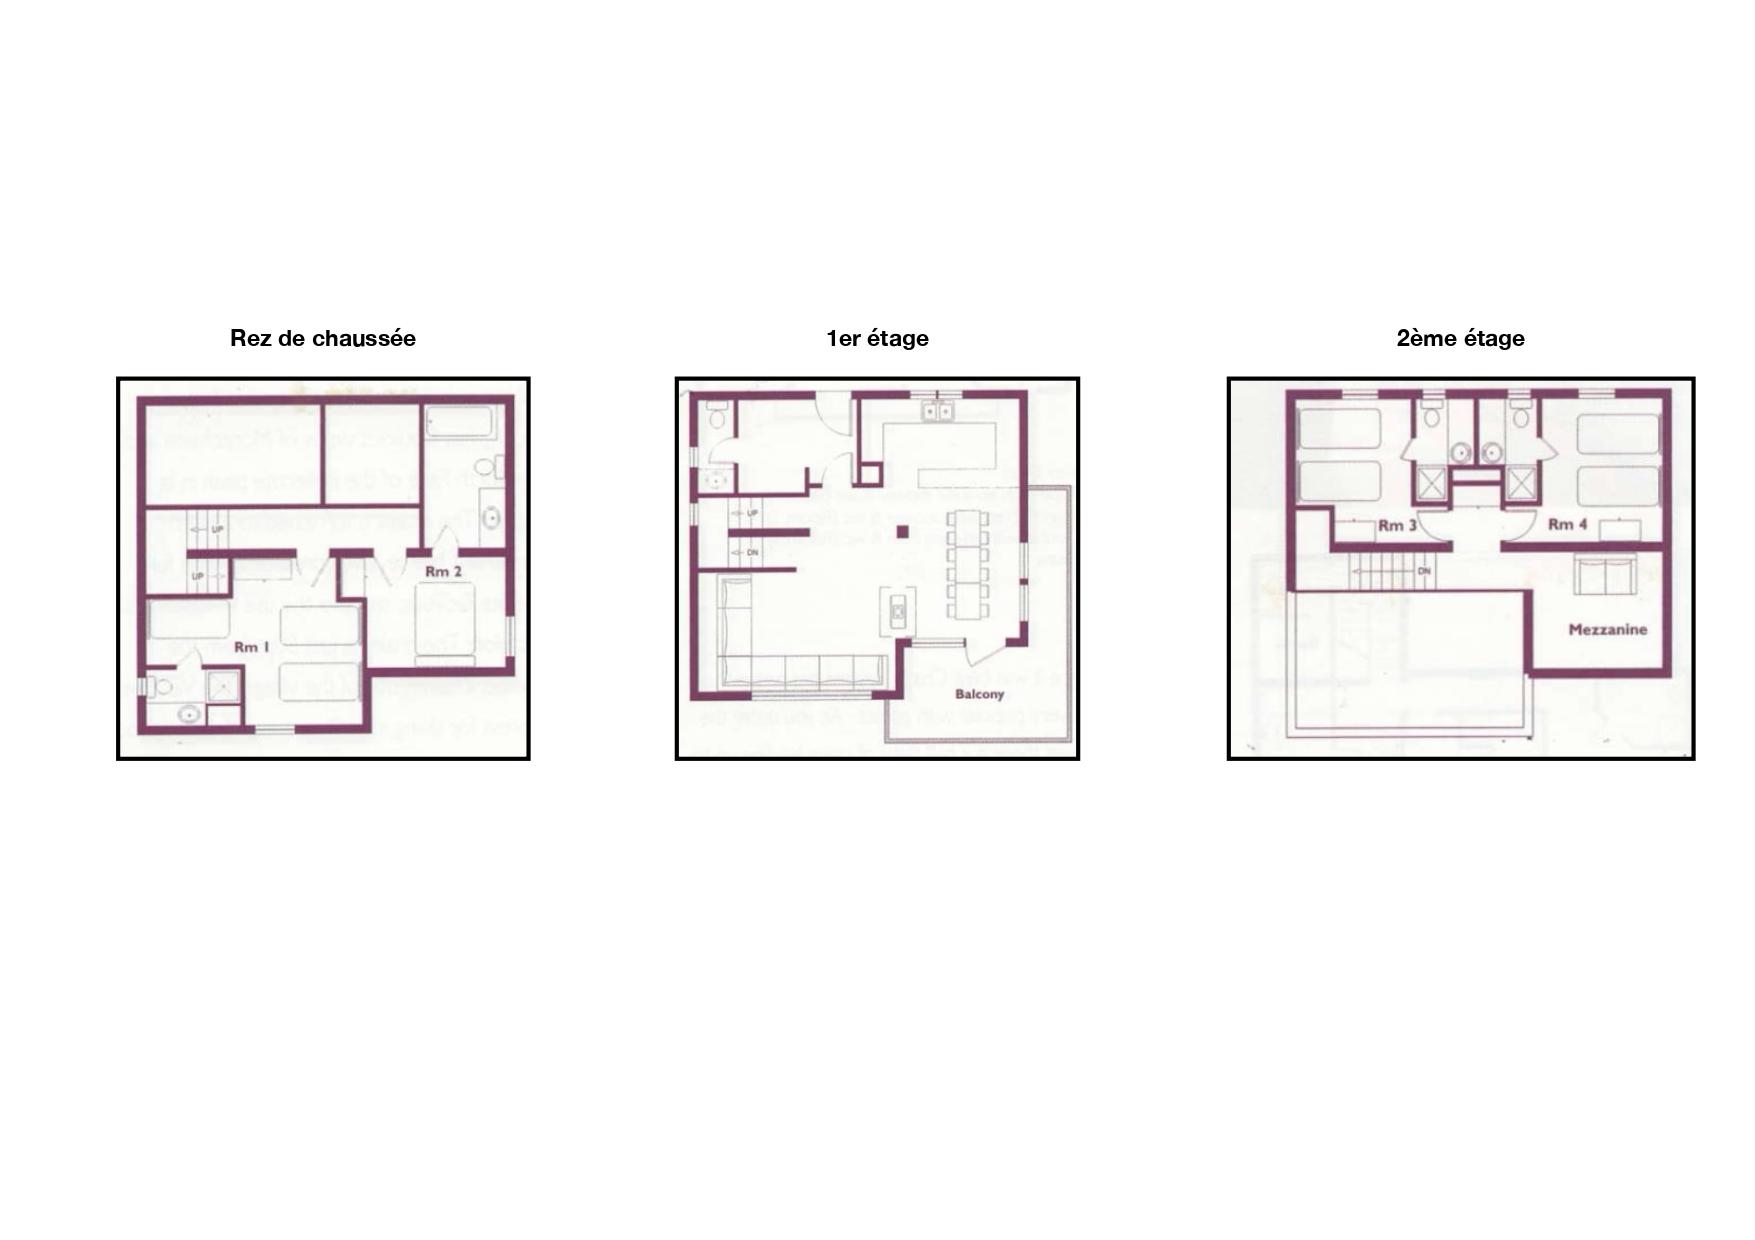 Herisson plan page 0001